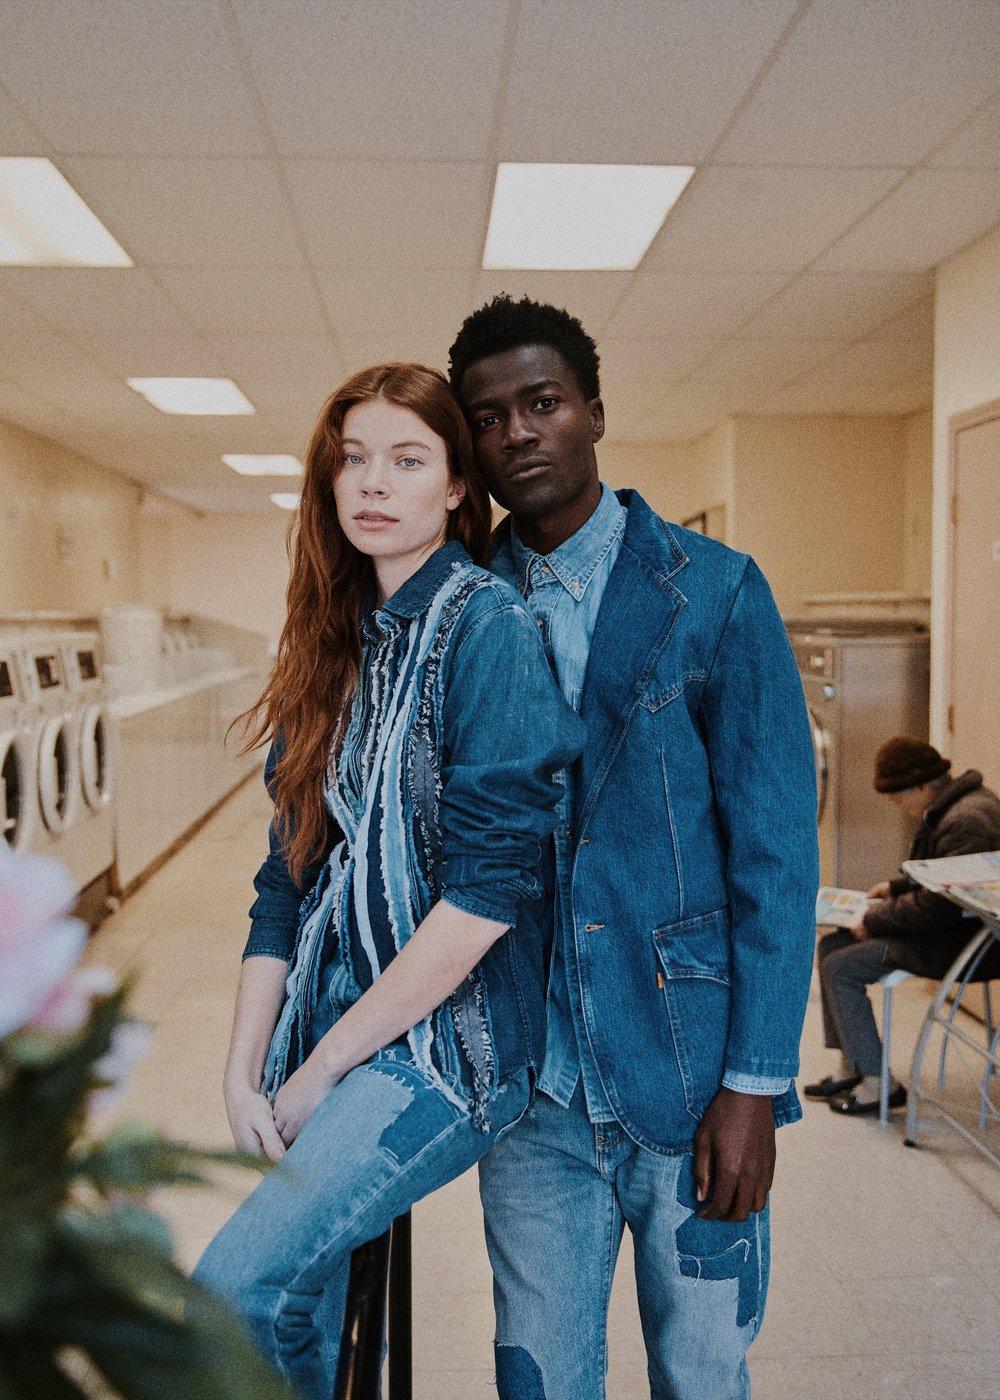 10_01_Laundromat-Arturo-Suzy-020_w.JPEG